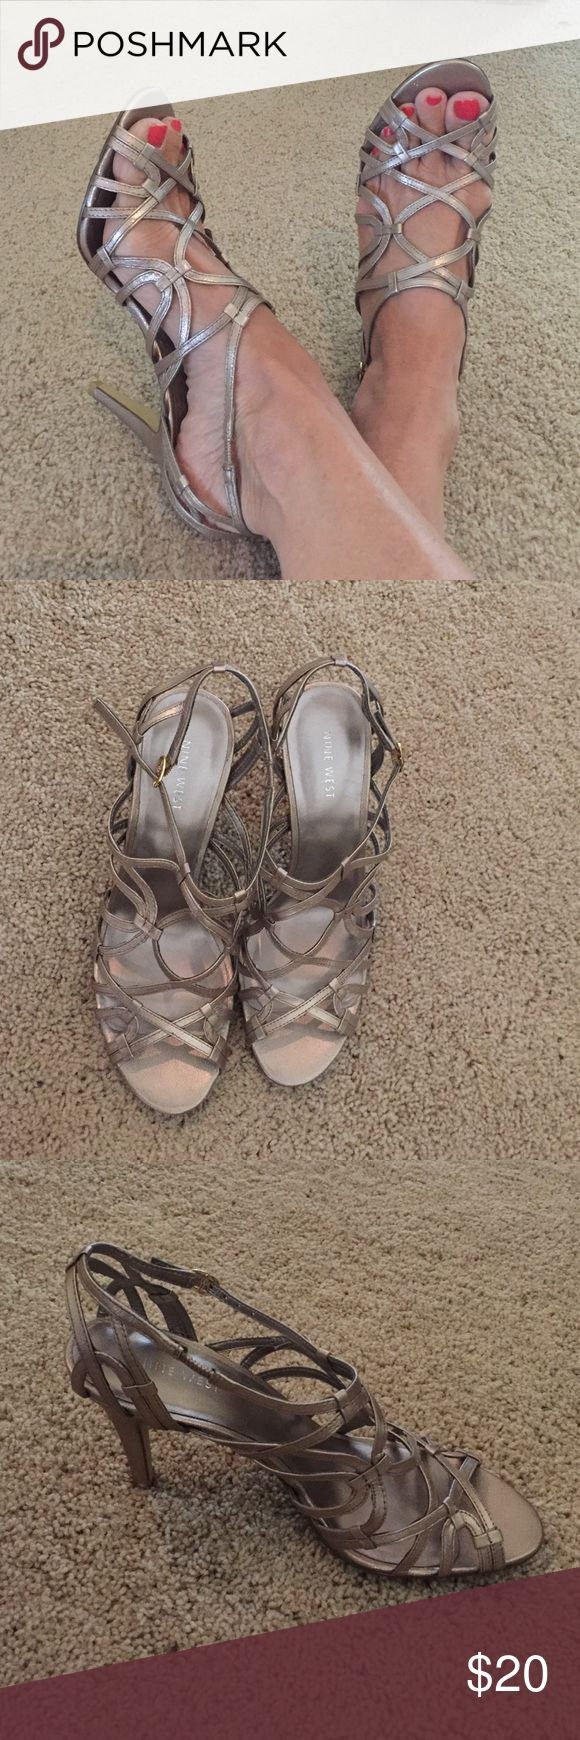 "Nine West- light gold strappy sandals, size 8 Super cute and comfortable-- Nine West- light gold strappy sandals, size 8. Approximately 3 1/2"" heel. Worn once. Nine West Shoes Sandals"